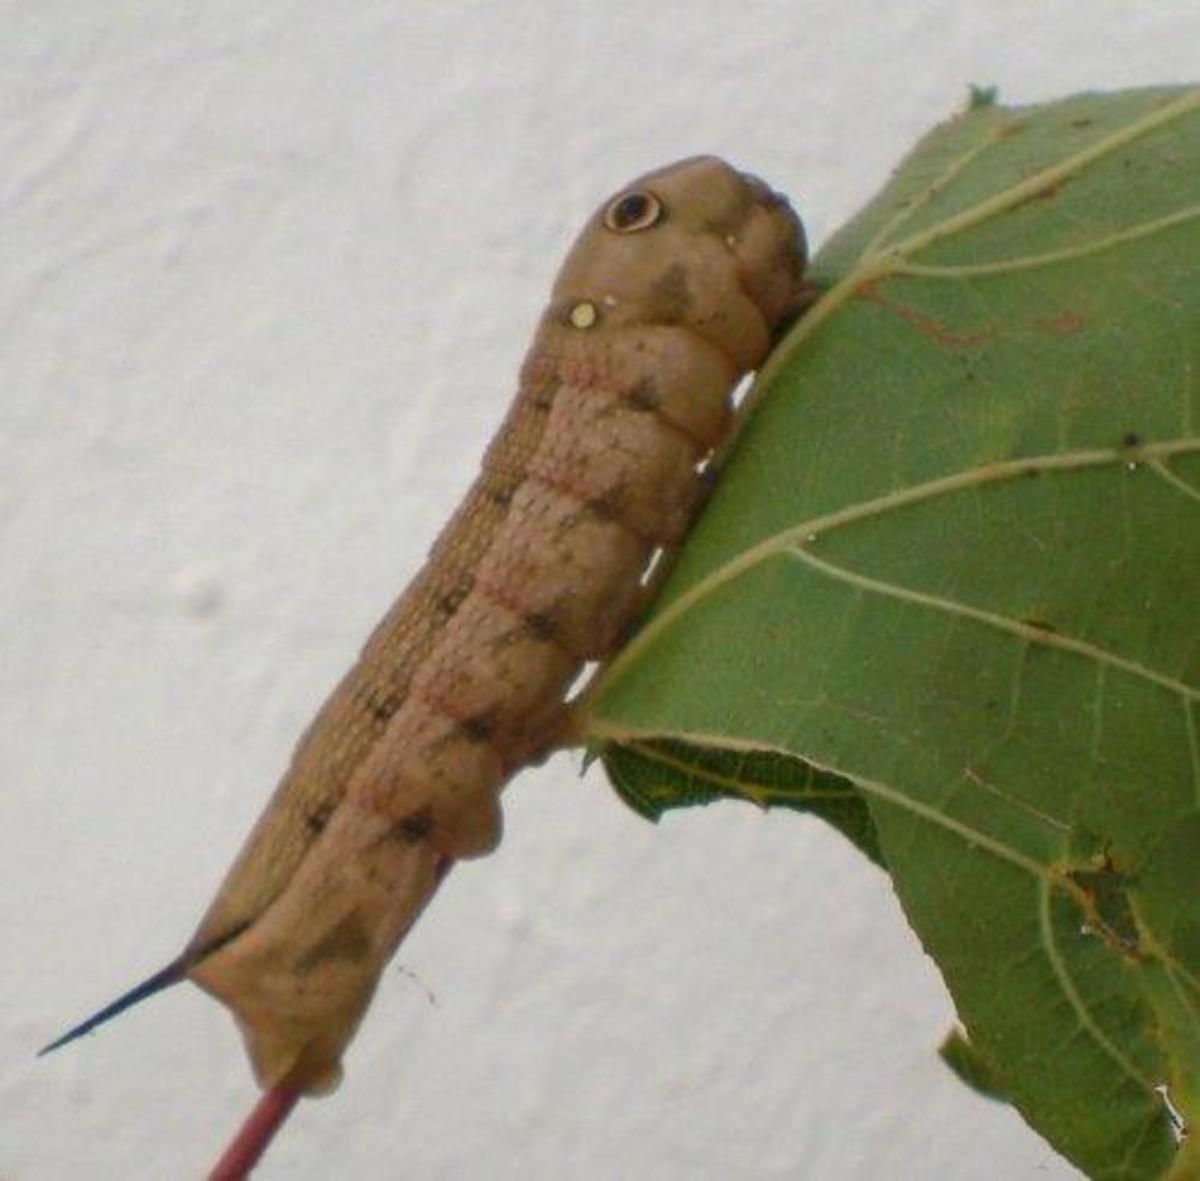 Vine Hawk Moth caterpillar